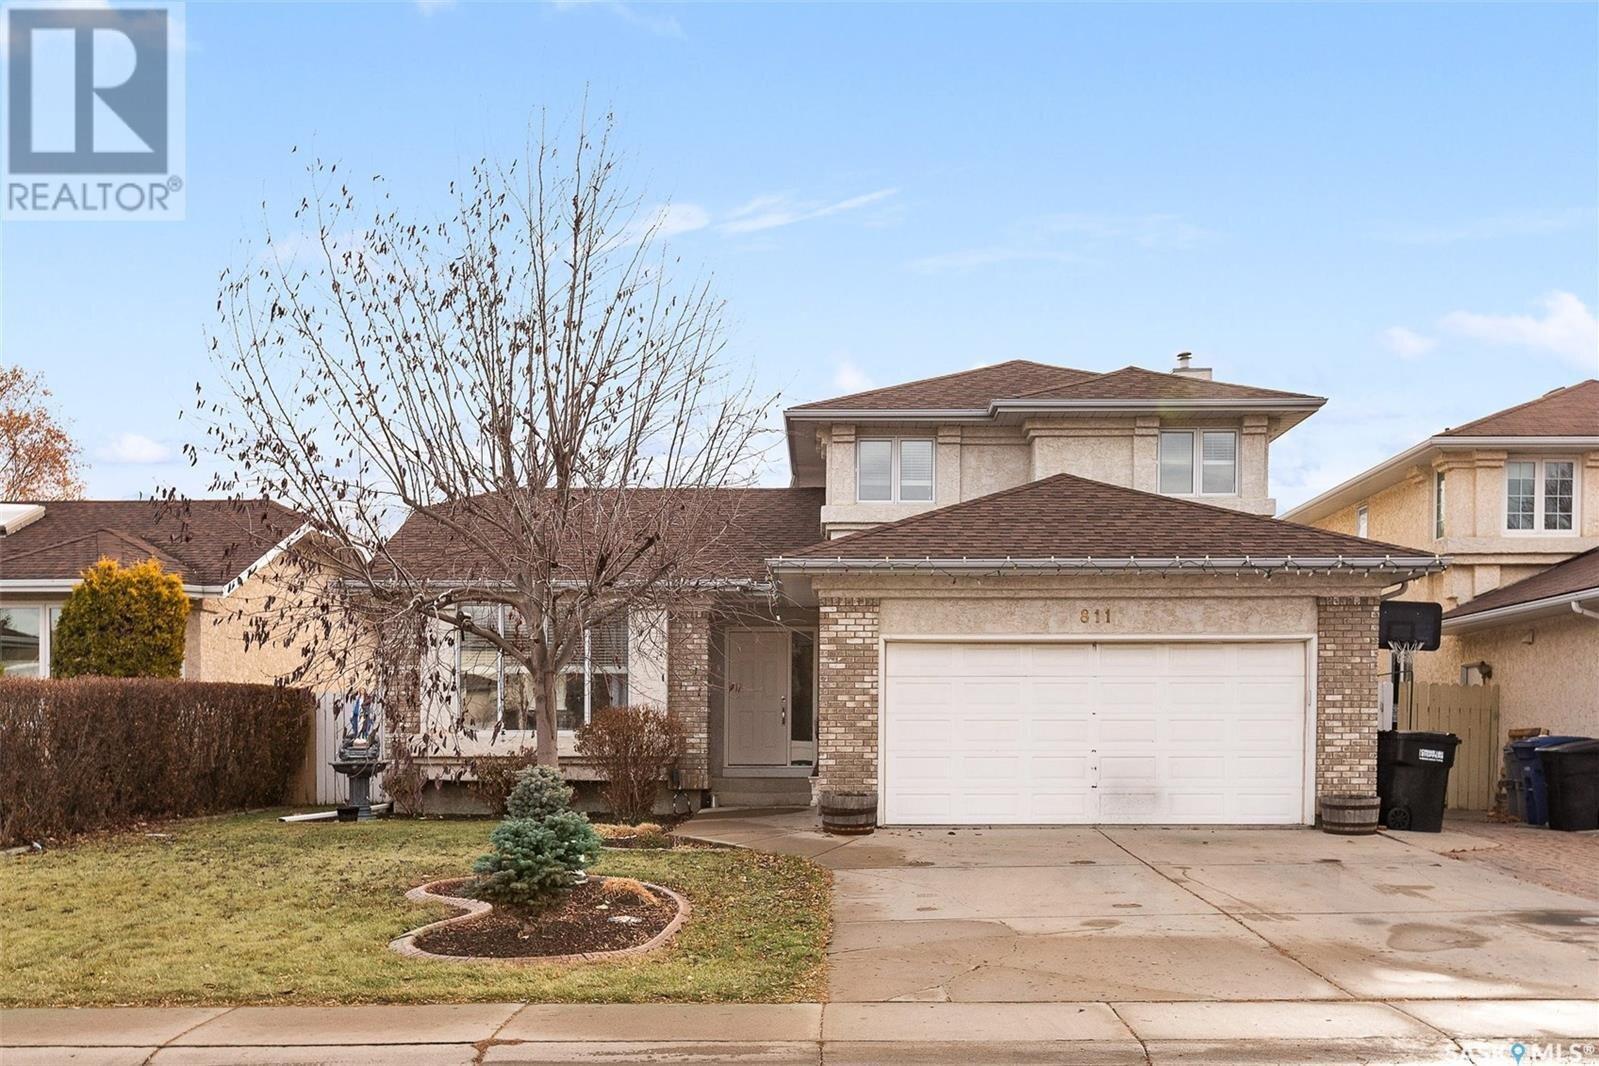 House for sale at 811 Steiger Cres Saskatoon Saskatchewan - MLS: SK834186